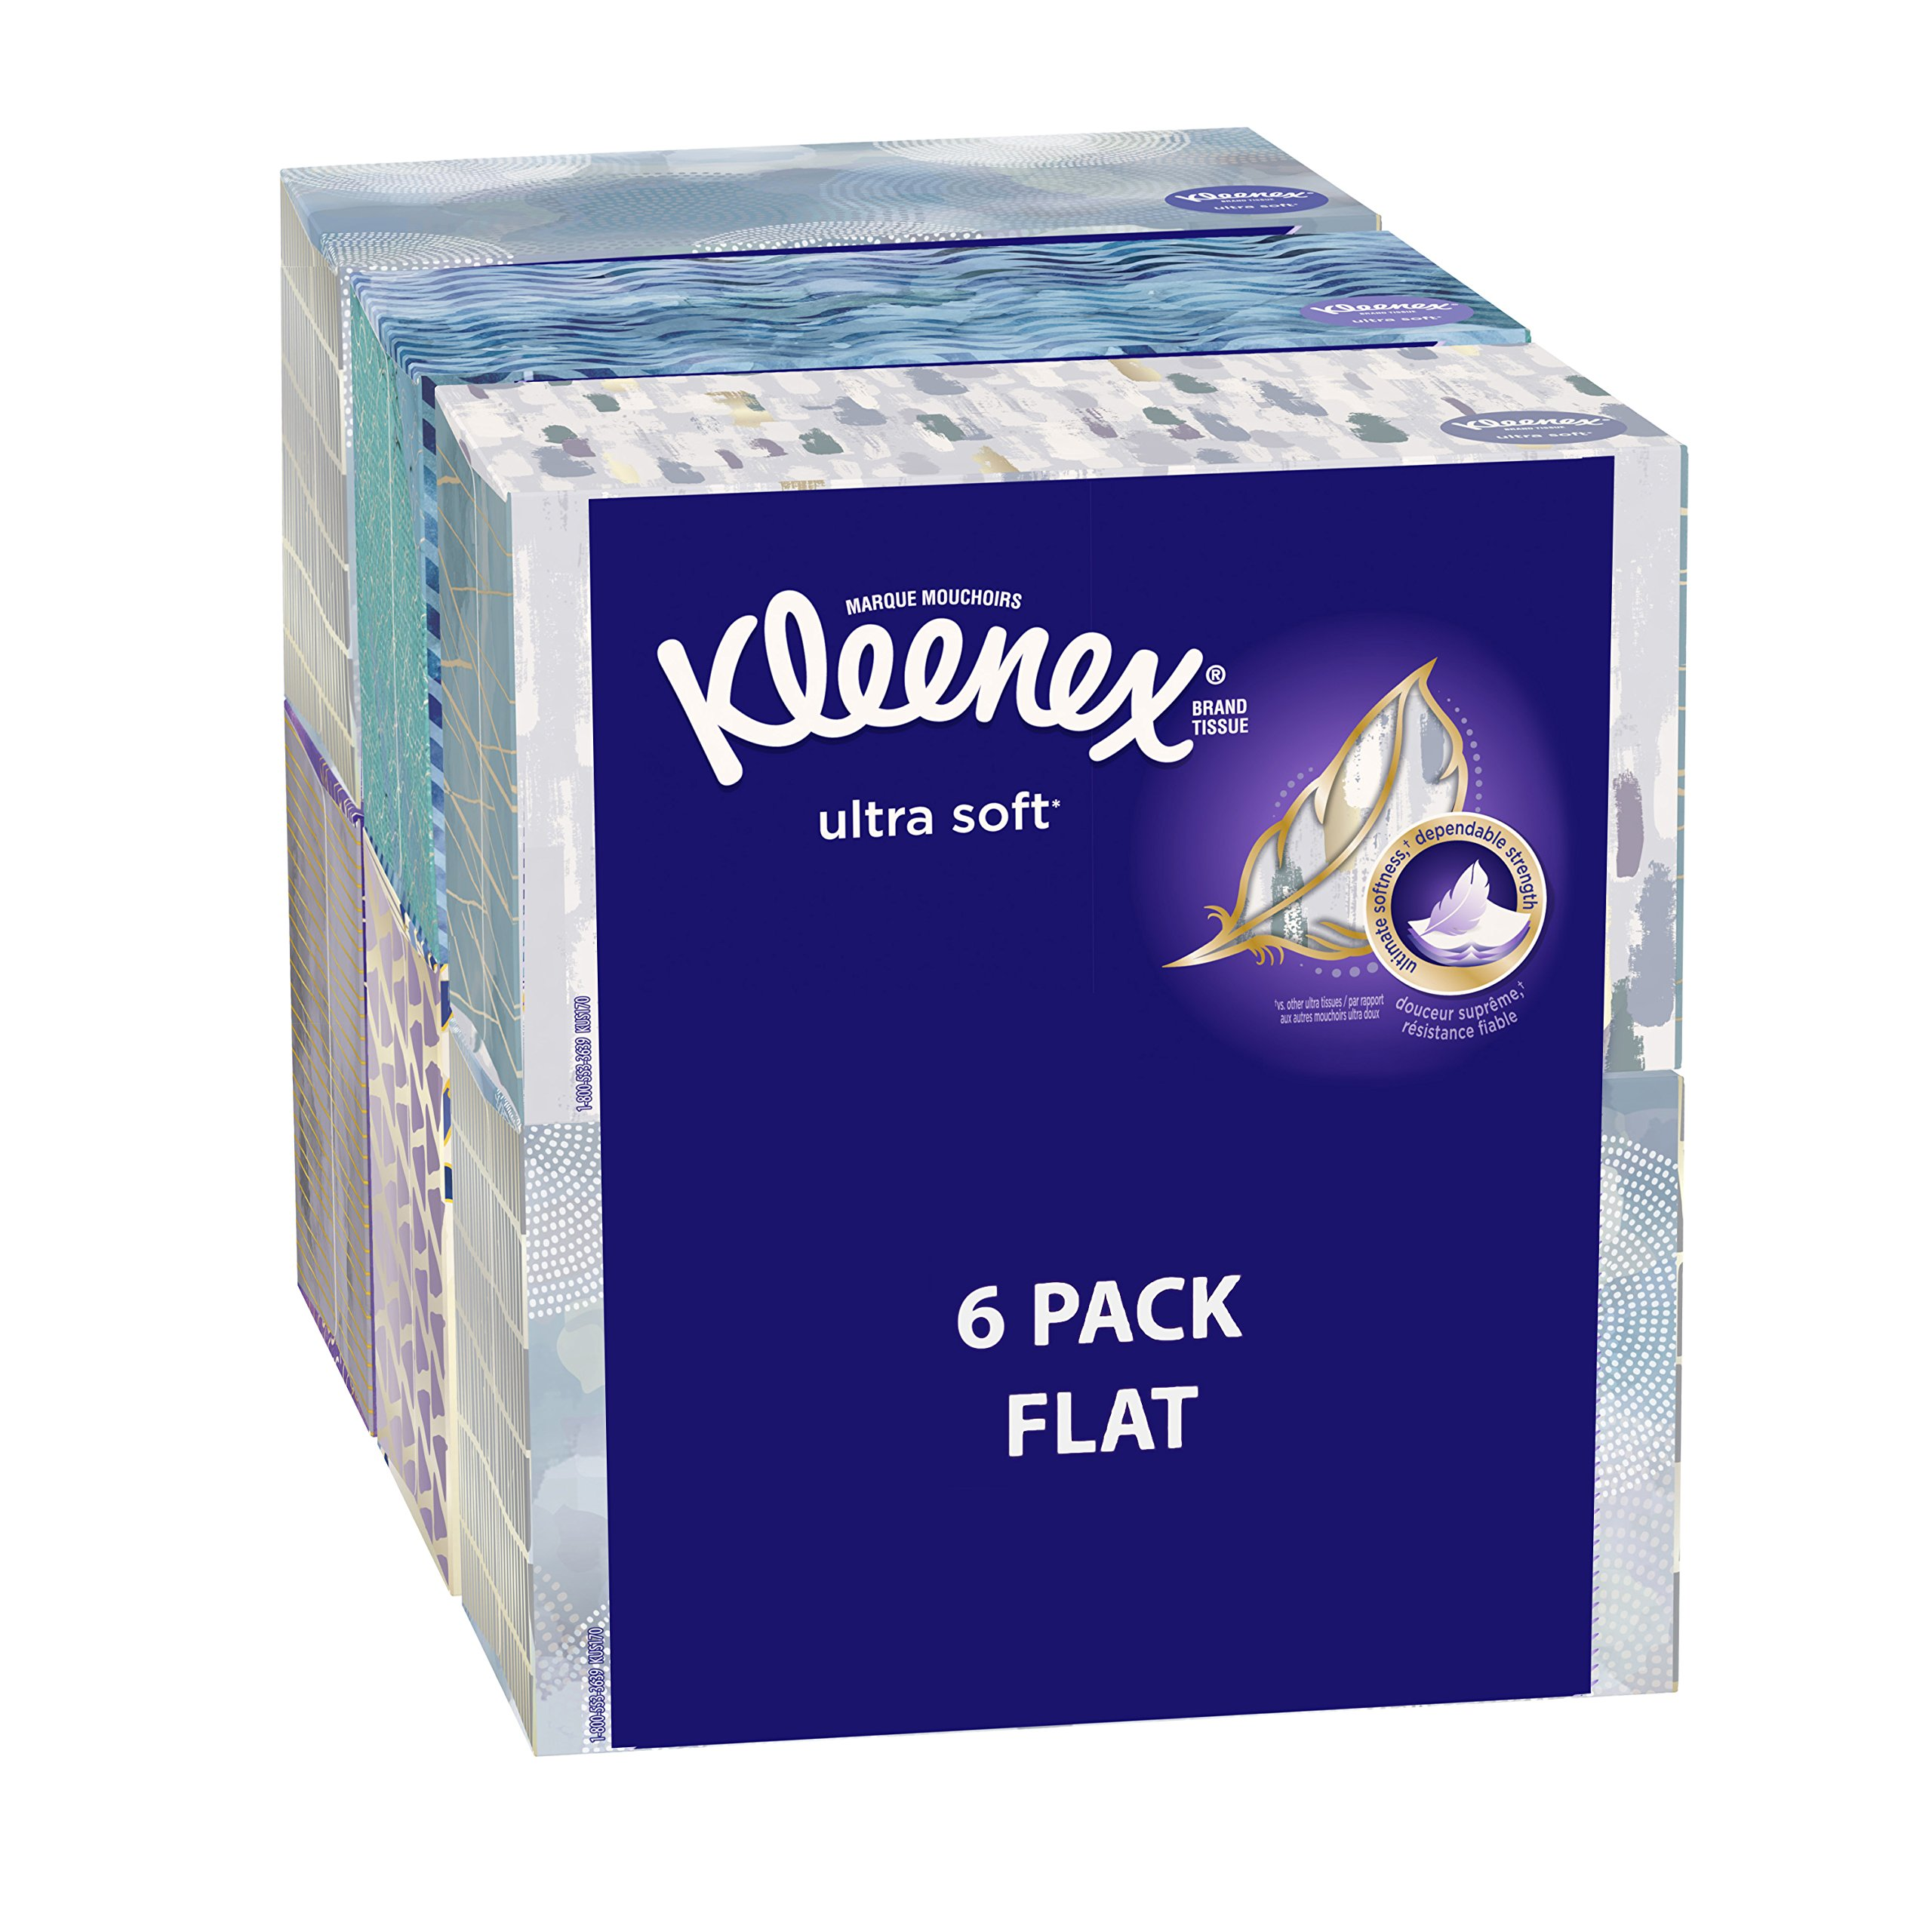 Kleenex Ultra Soft Facial Tissues, Medium Count Flat, 170 ct, 6 Pack.